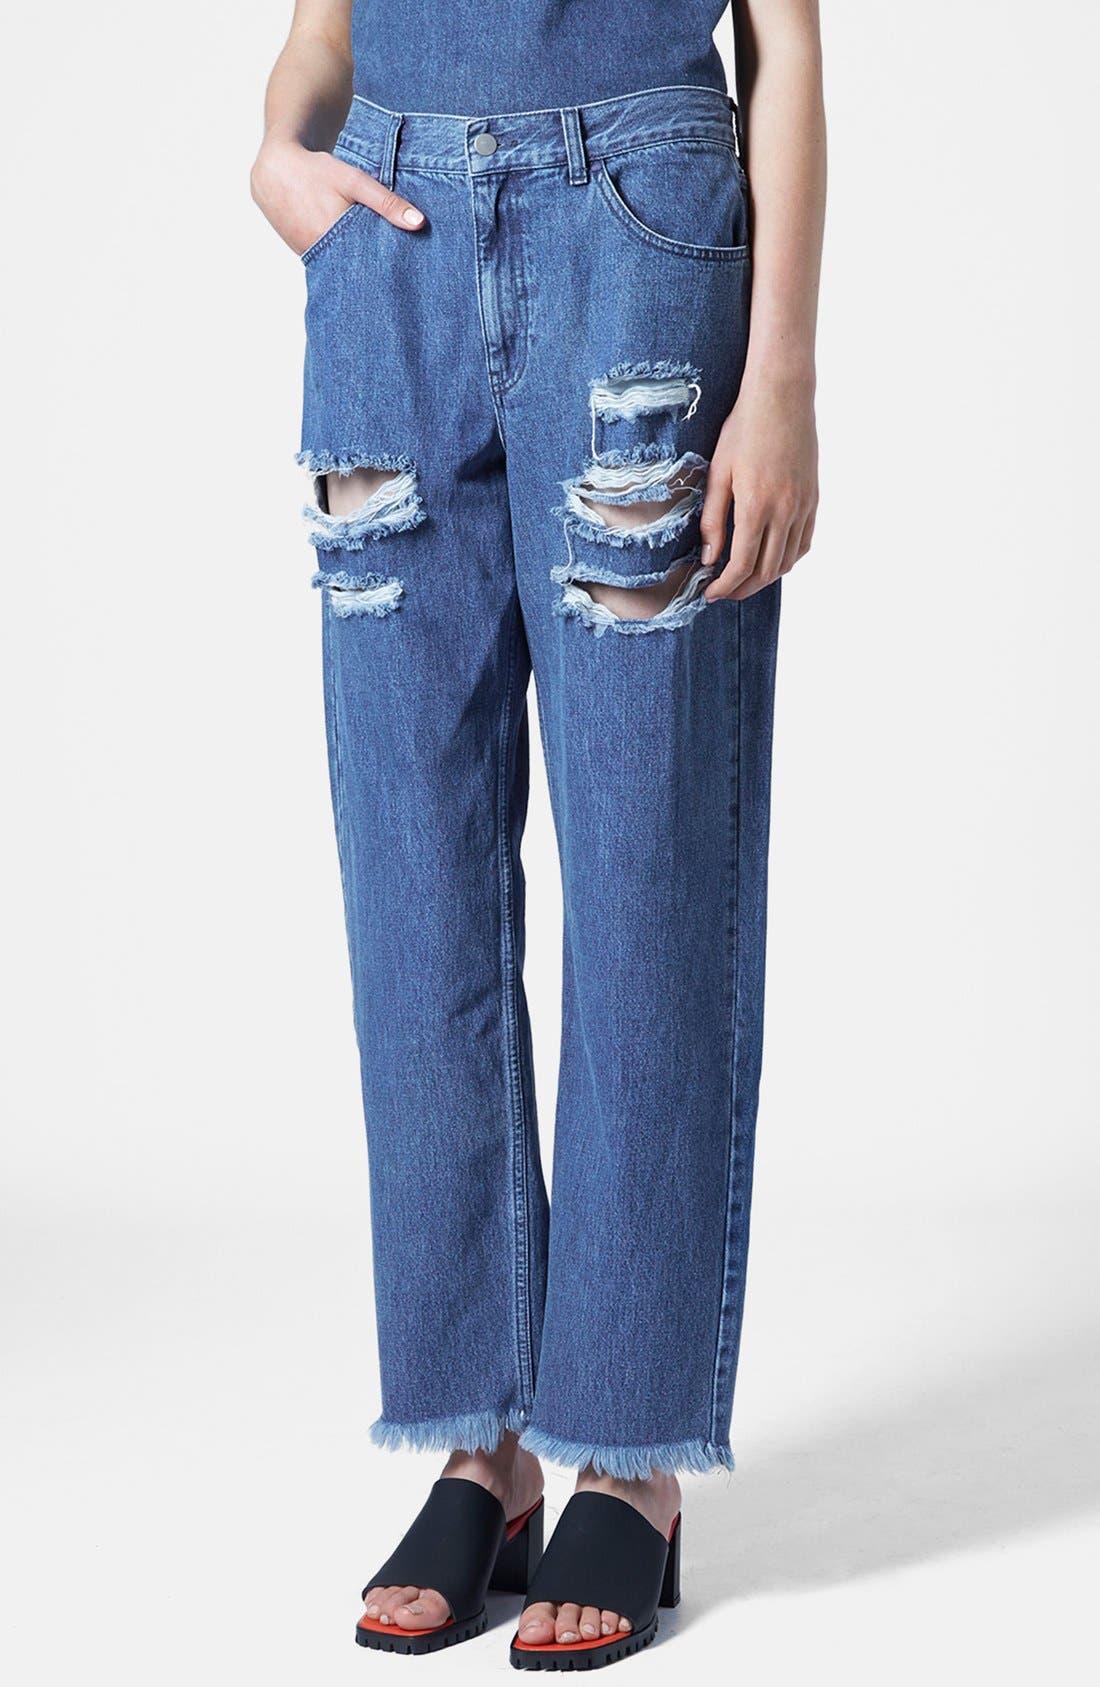 Alternate Image 1 Selected - Marques'Almeida for Topshop Slashed Boyfriend Jeans (Mid Denim)